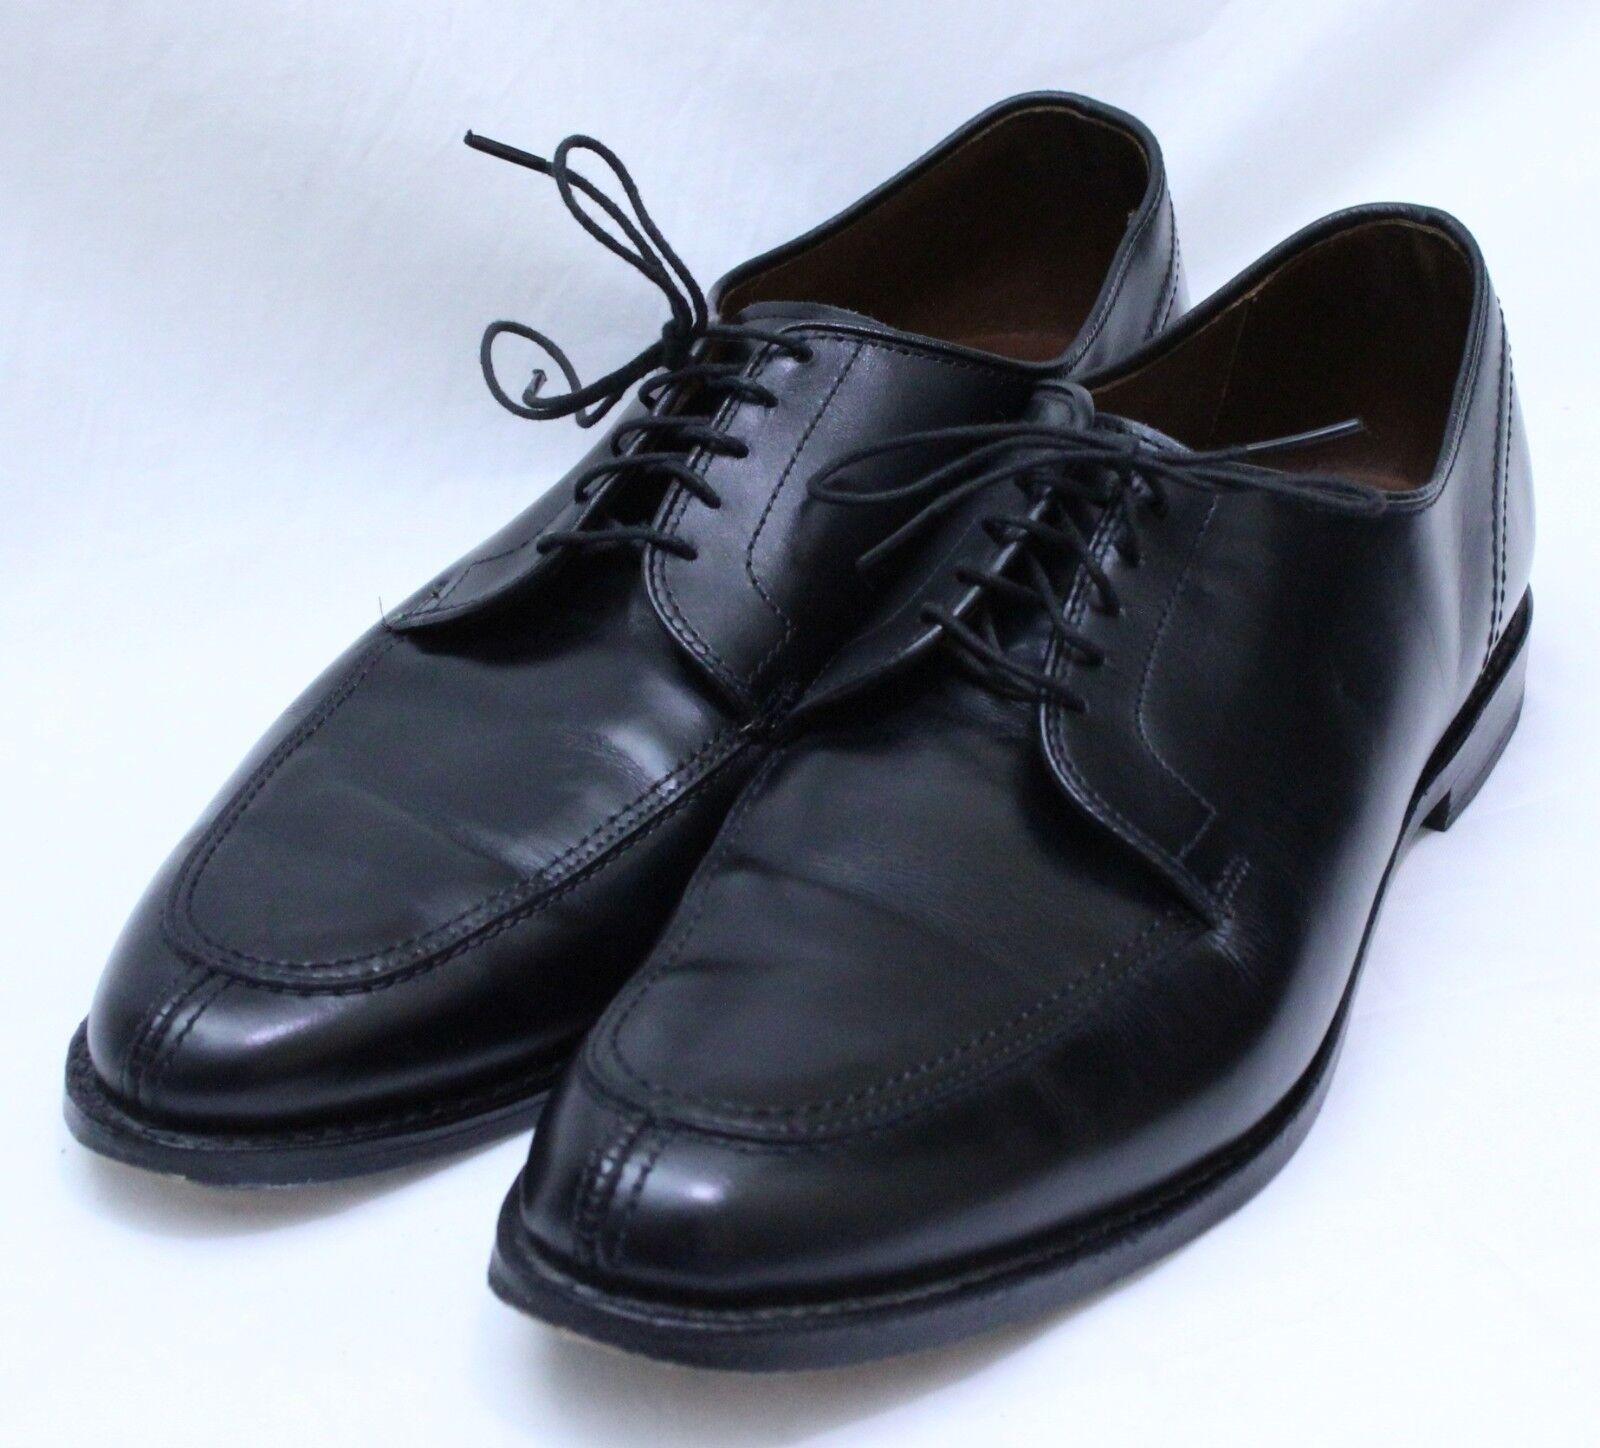 Allen Edmonds LaSalle Split-Toe Oxfords Black 11B  350 4308